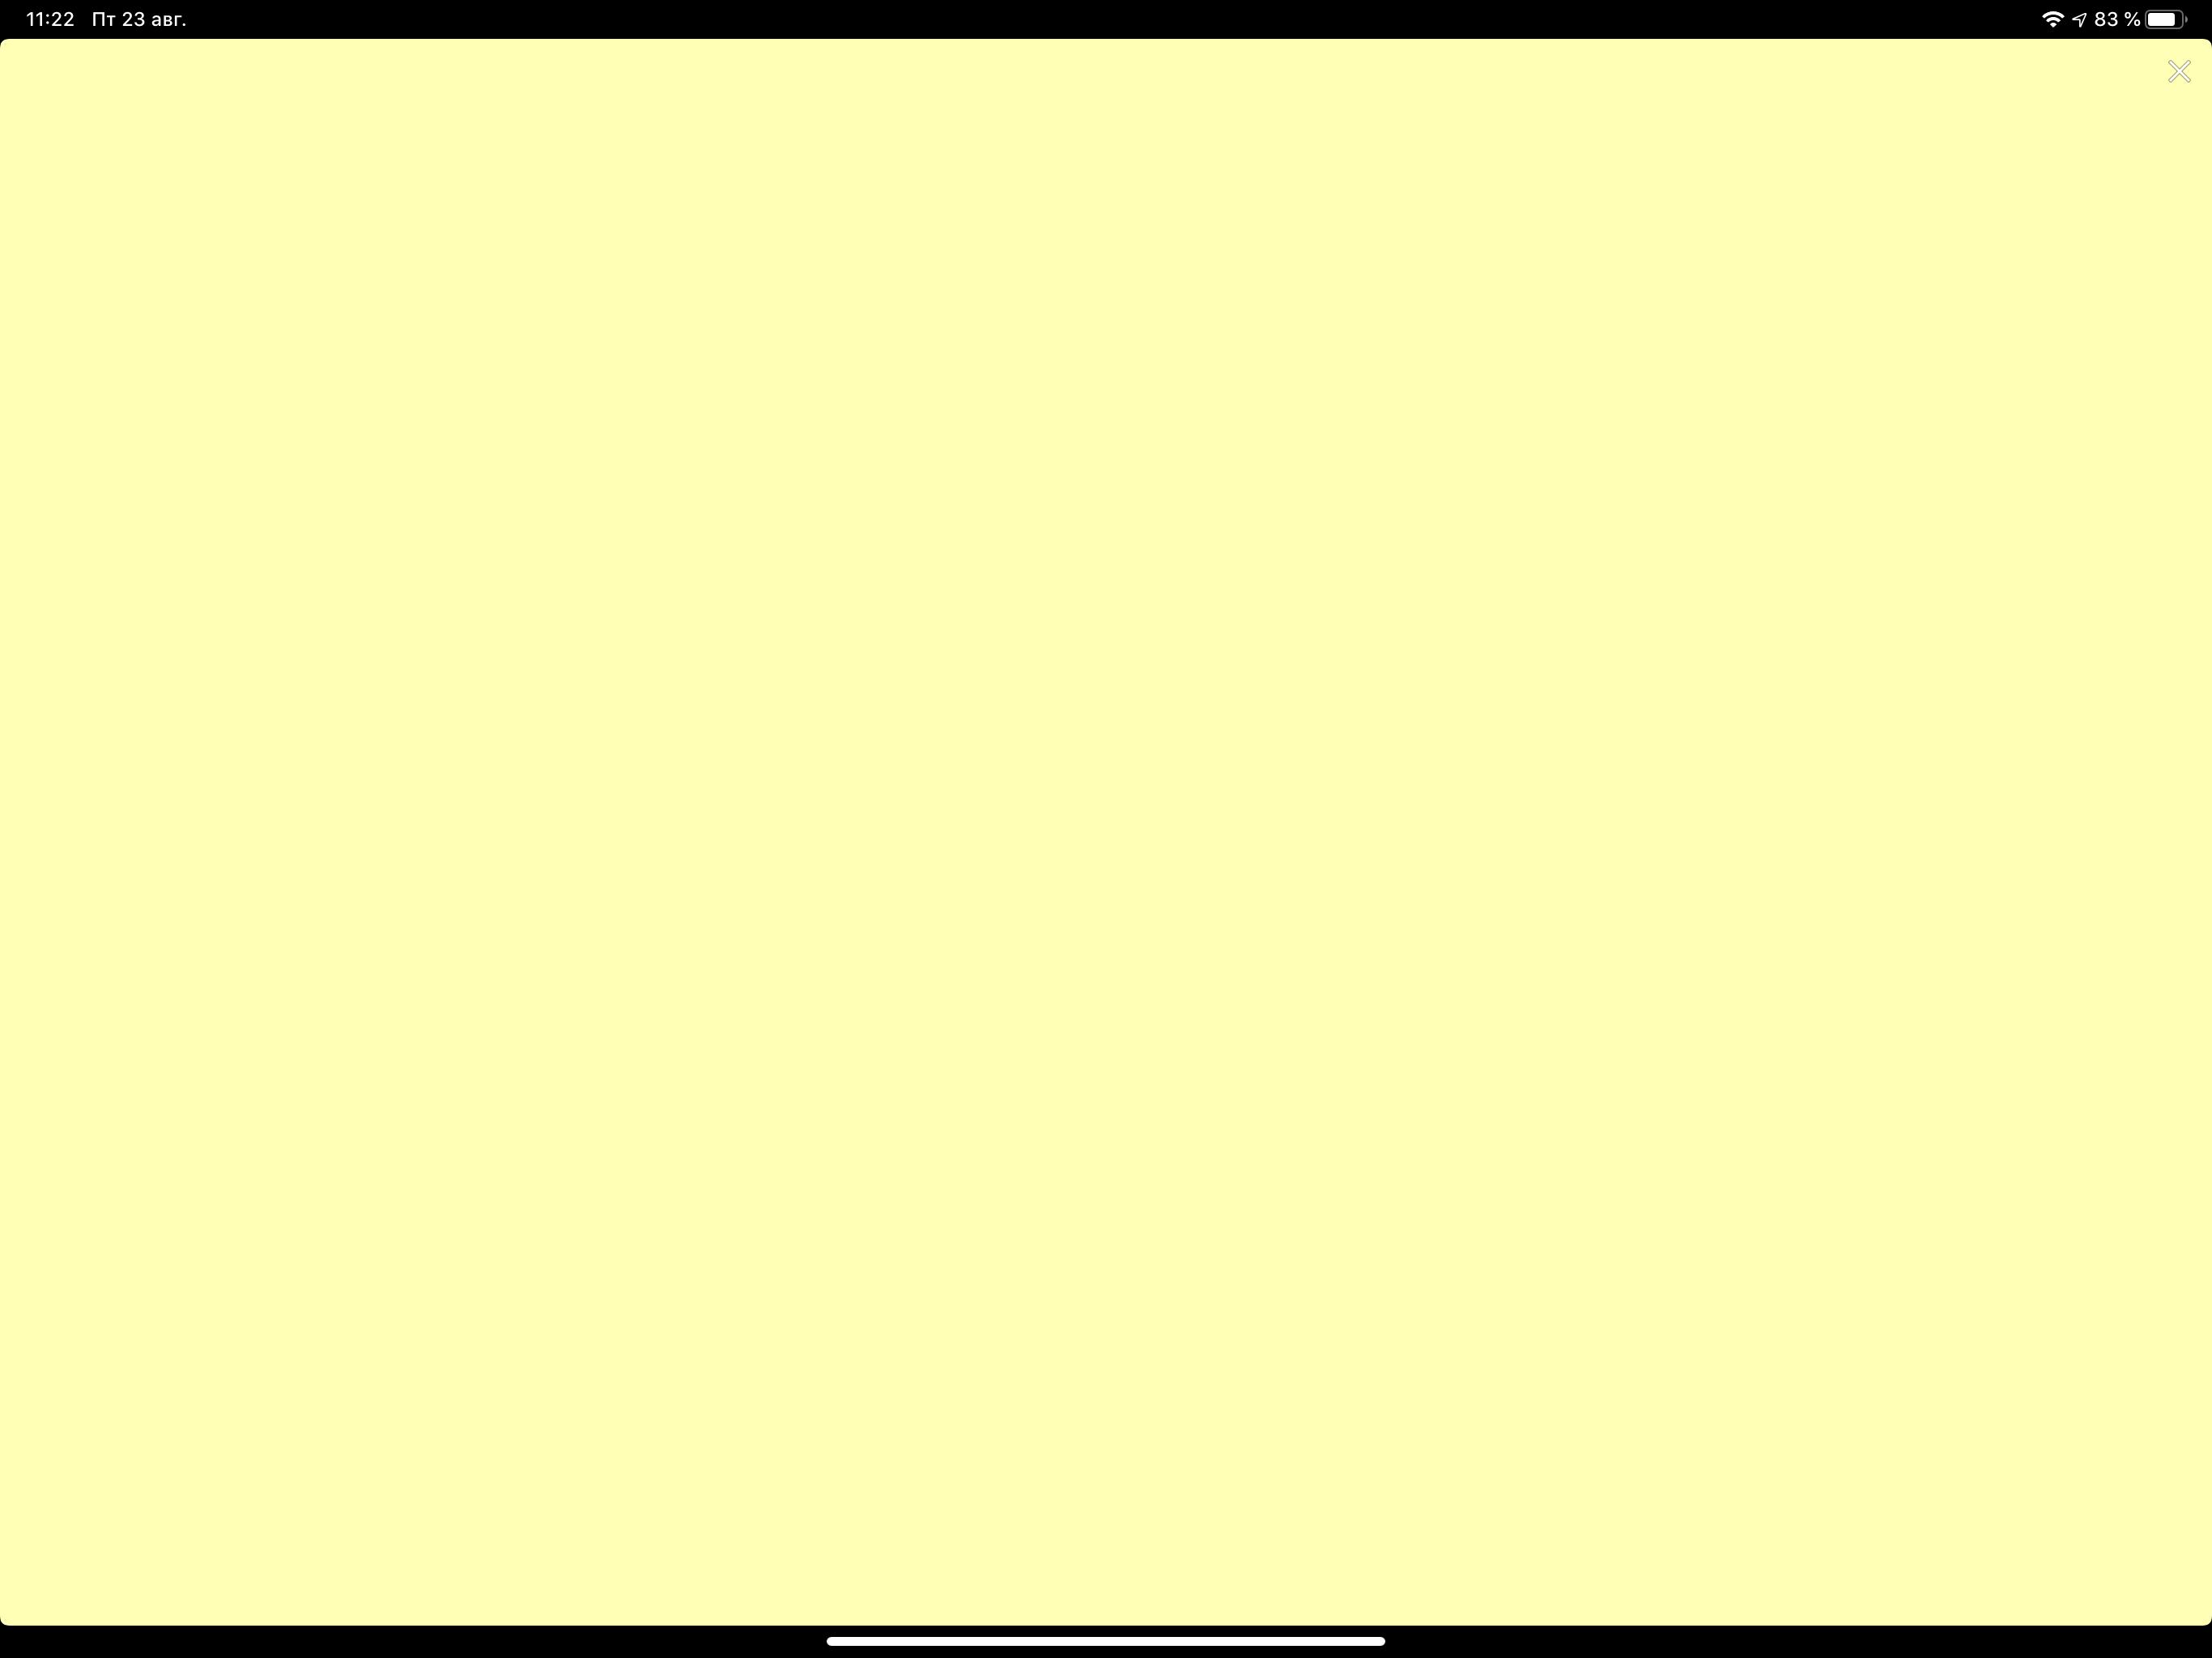 Написание змейки на ipad (pythonista) - 6